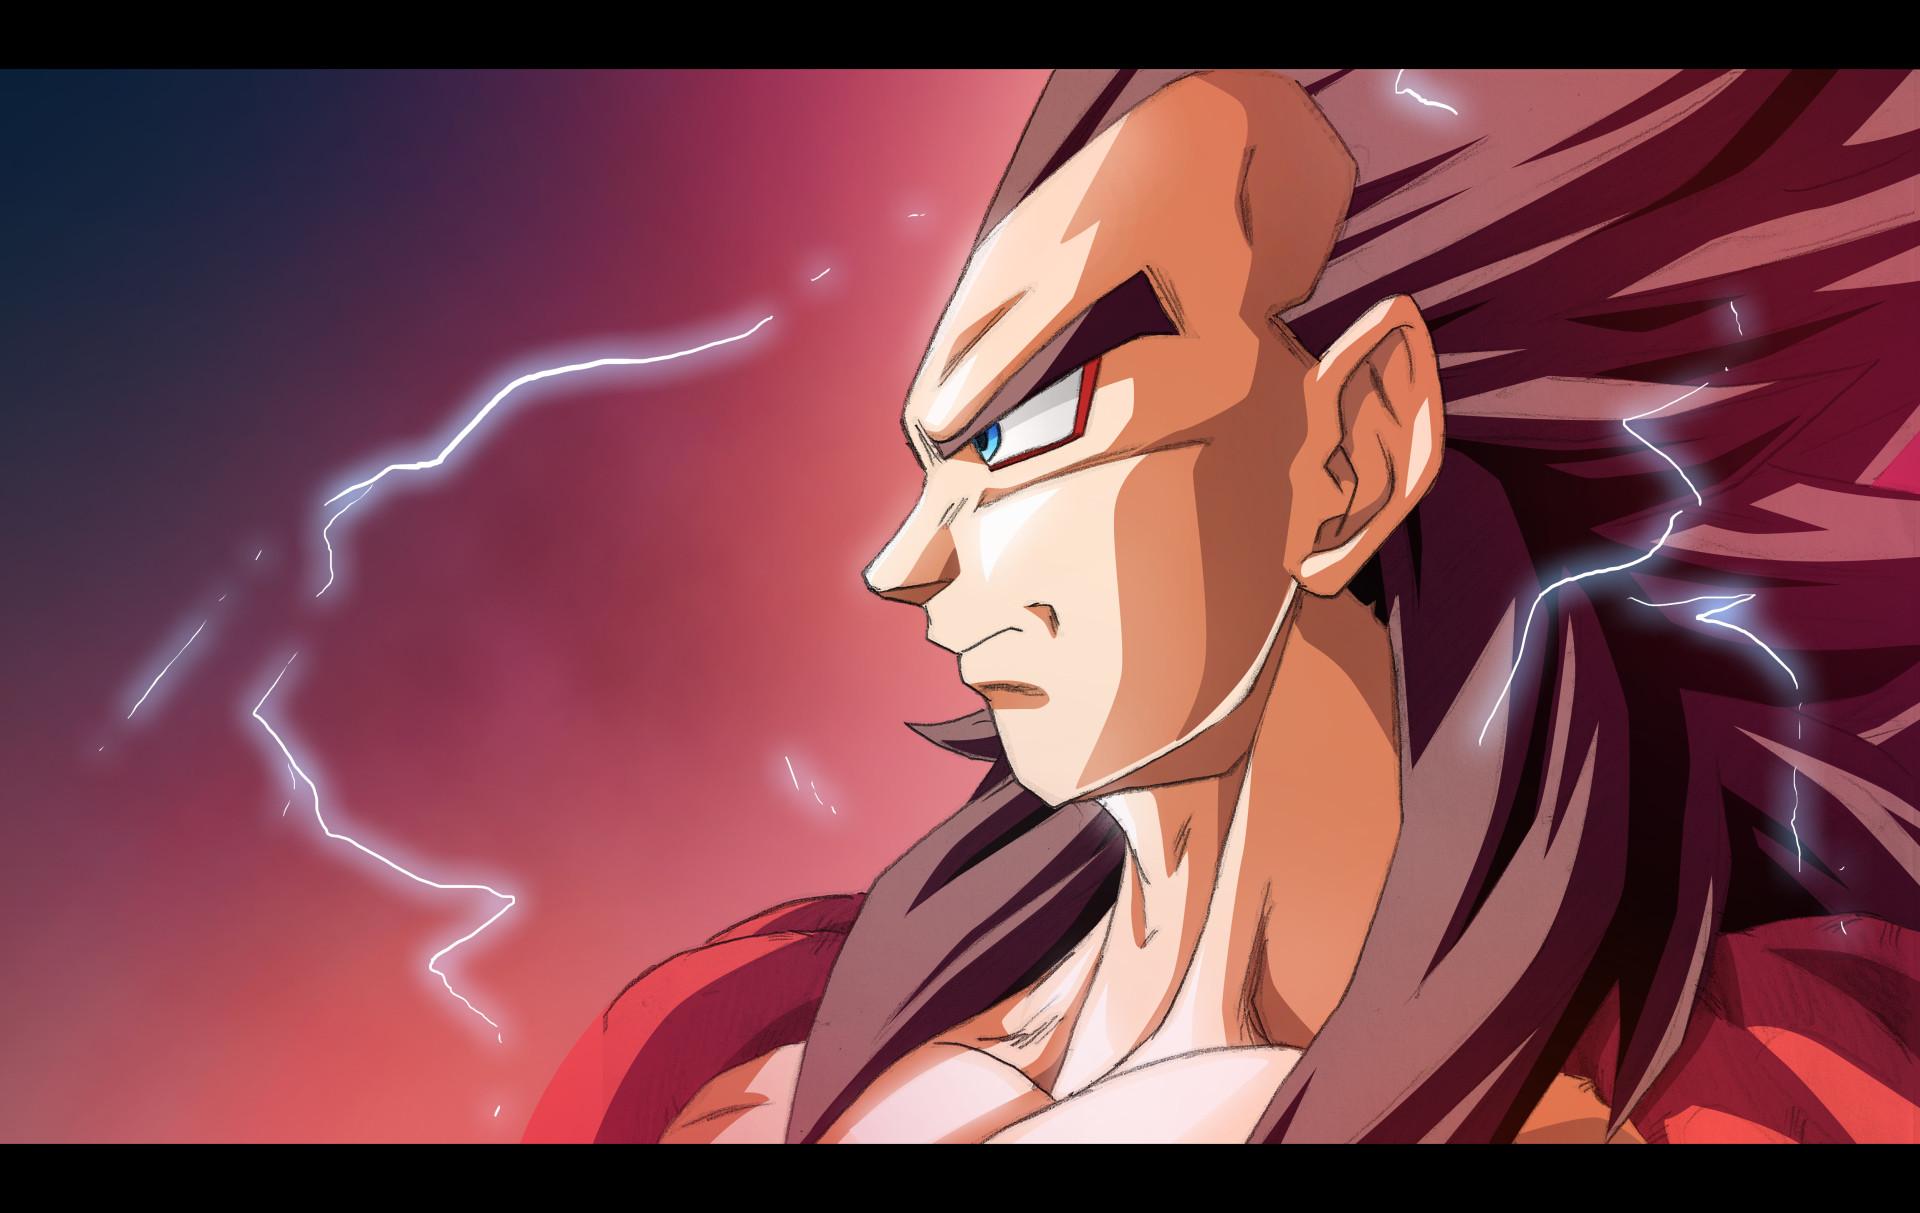 Anime Dragon Ball Super Vegeta (Dragon Ball) Wallpaper